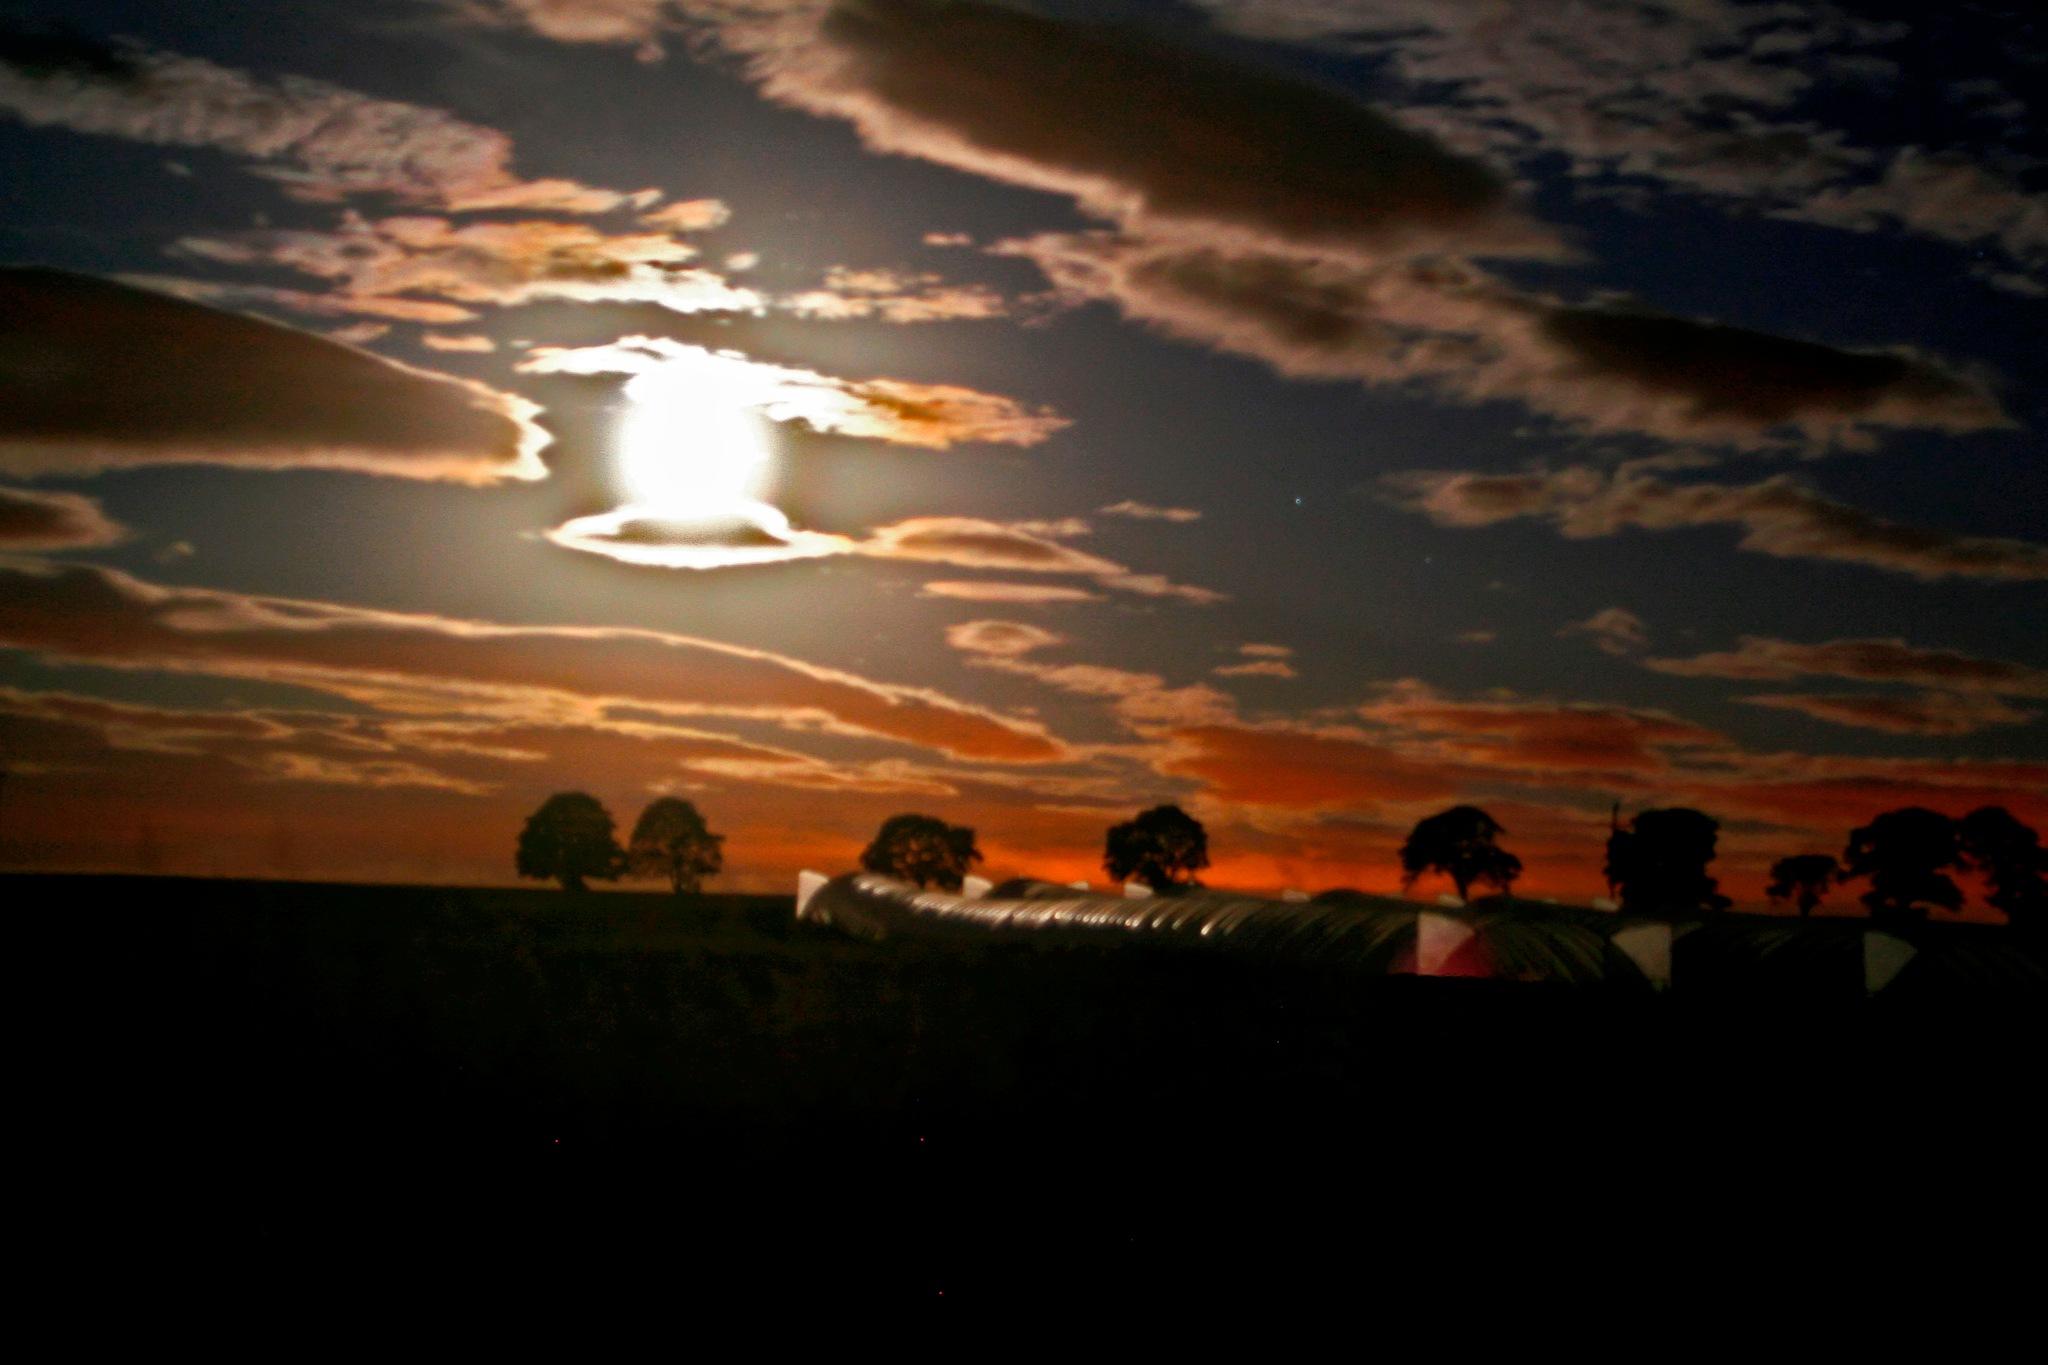 Harvest moon by Nick Birch